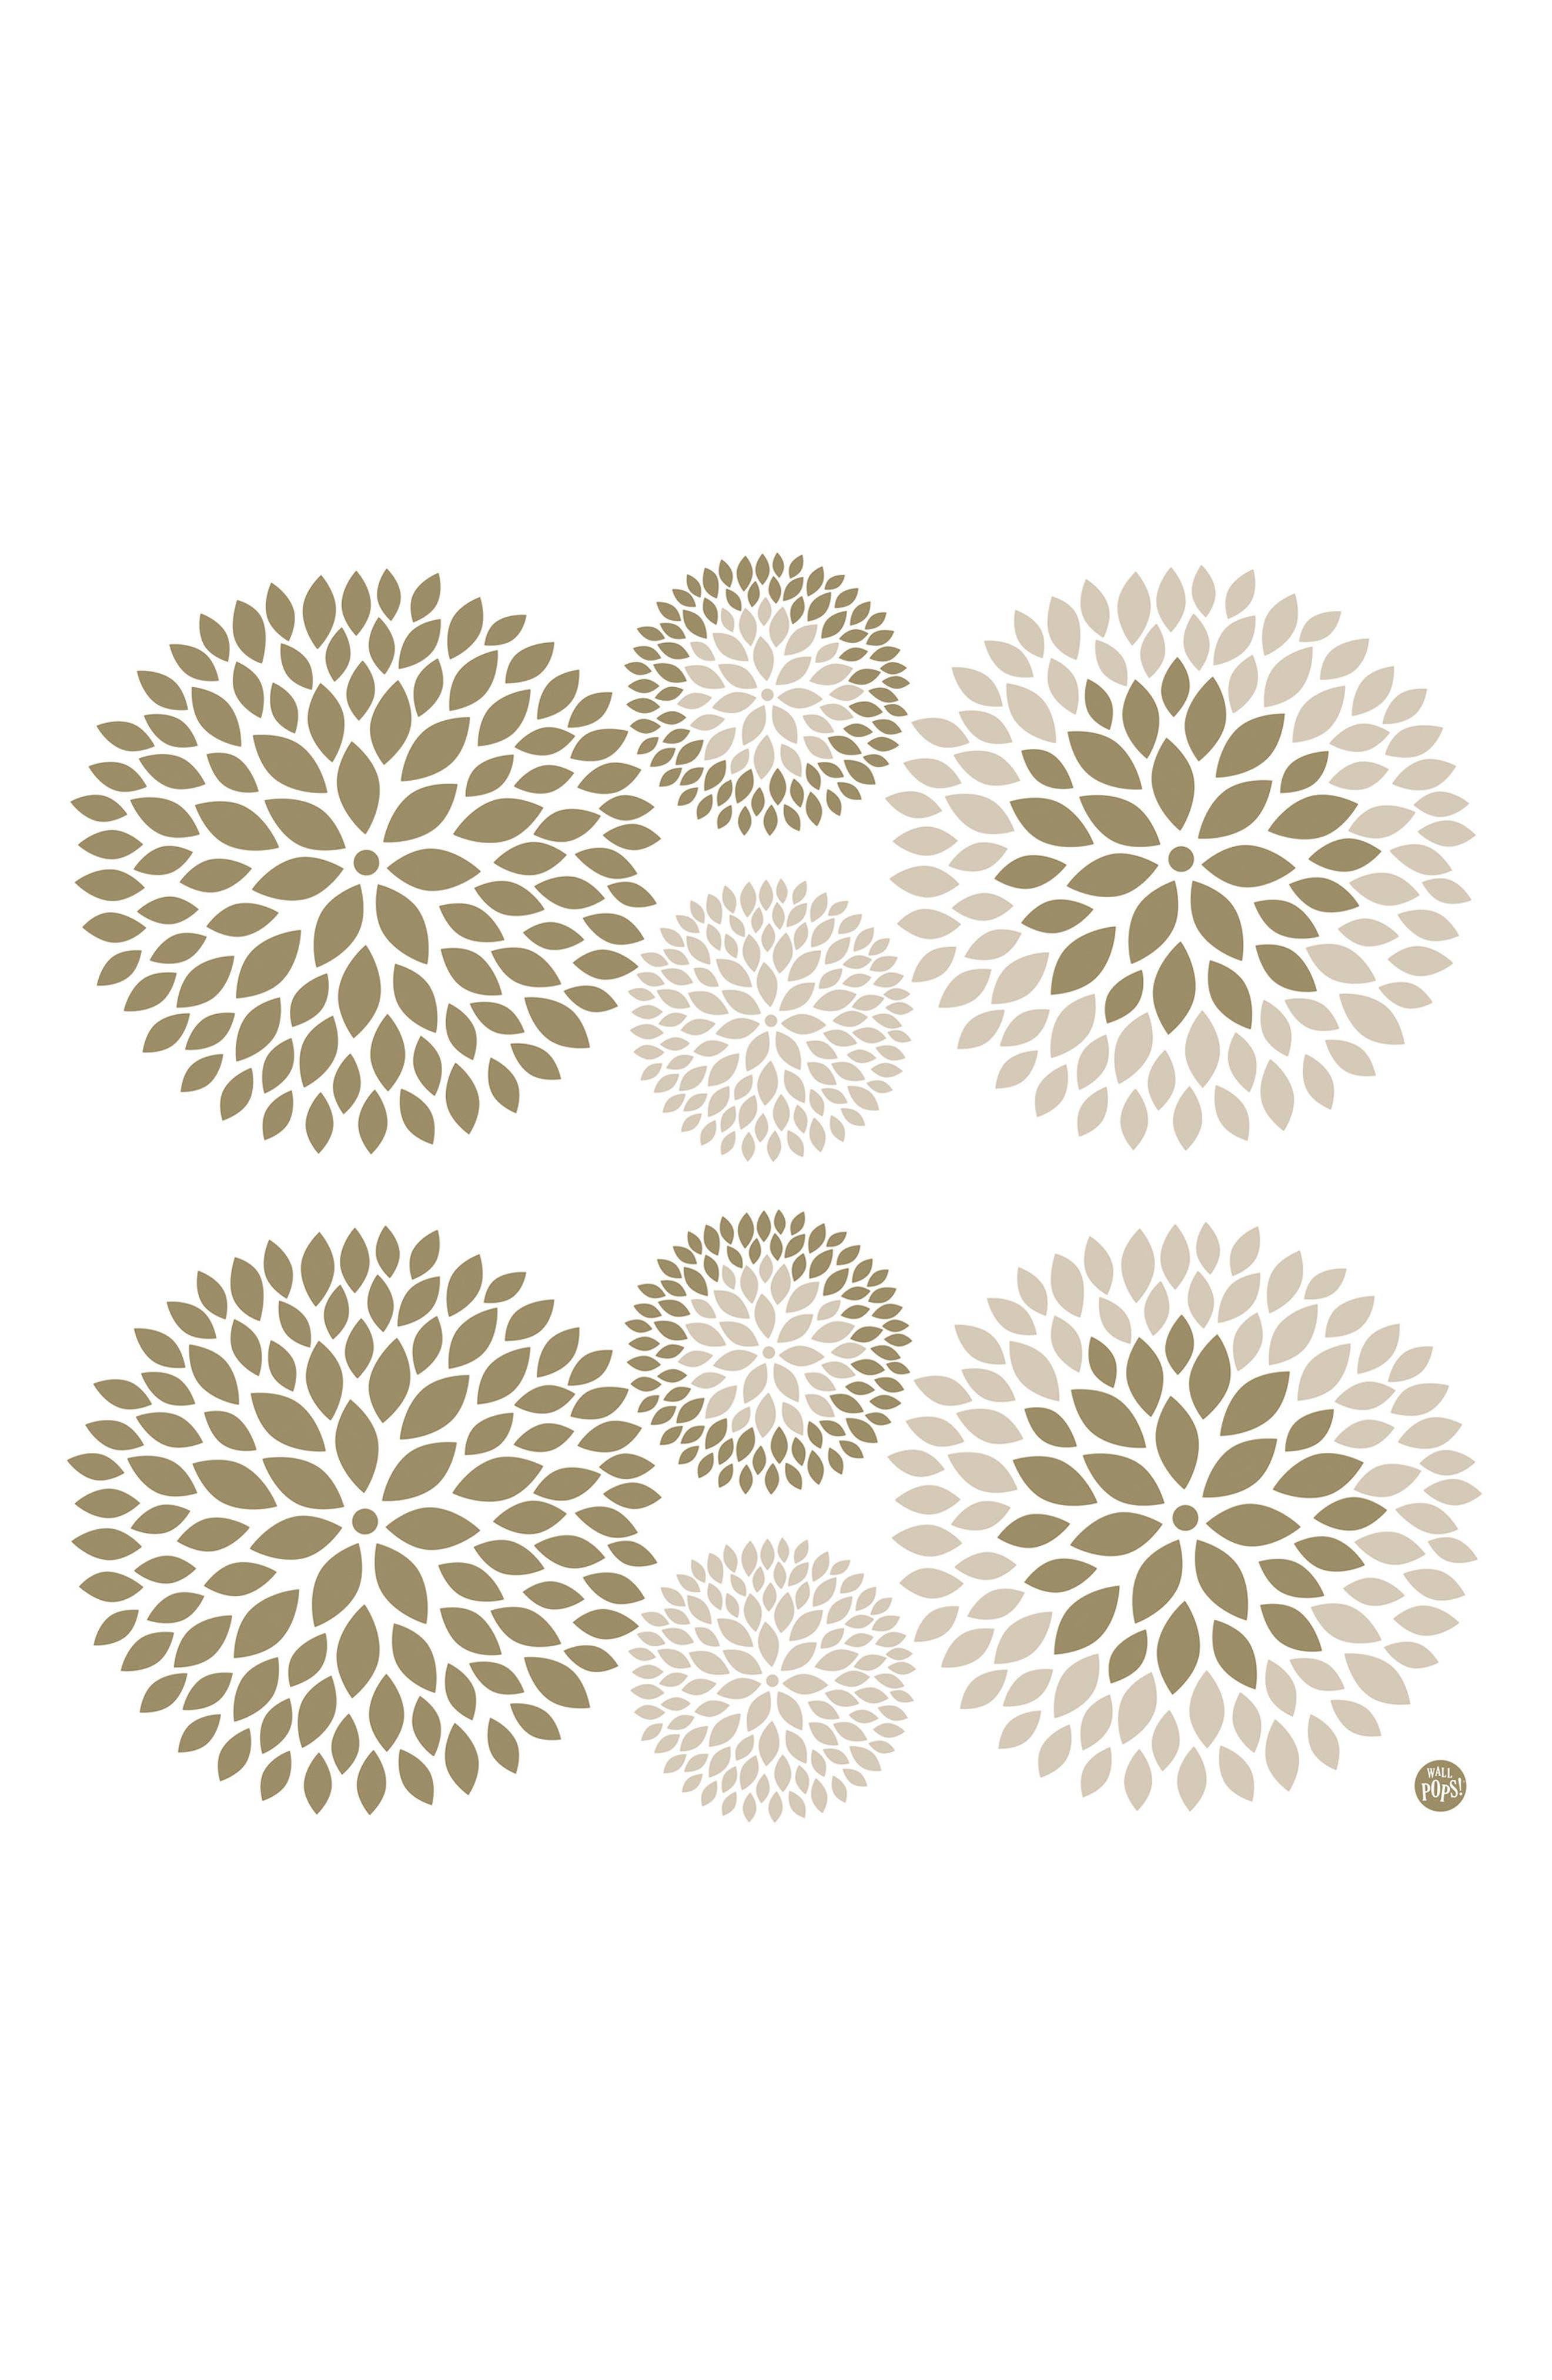 Alternate Image 1 Selected - Wallpops Chrysanthemum 8-Piece Wall Art Decal Set